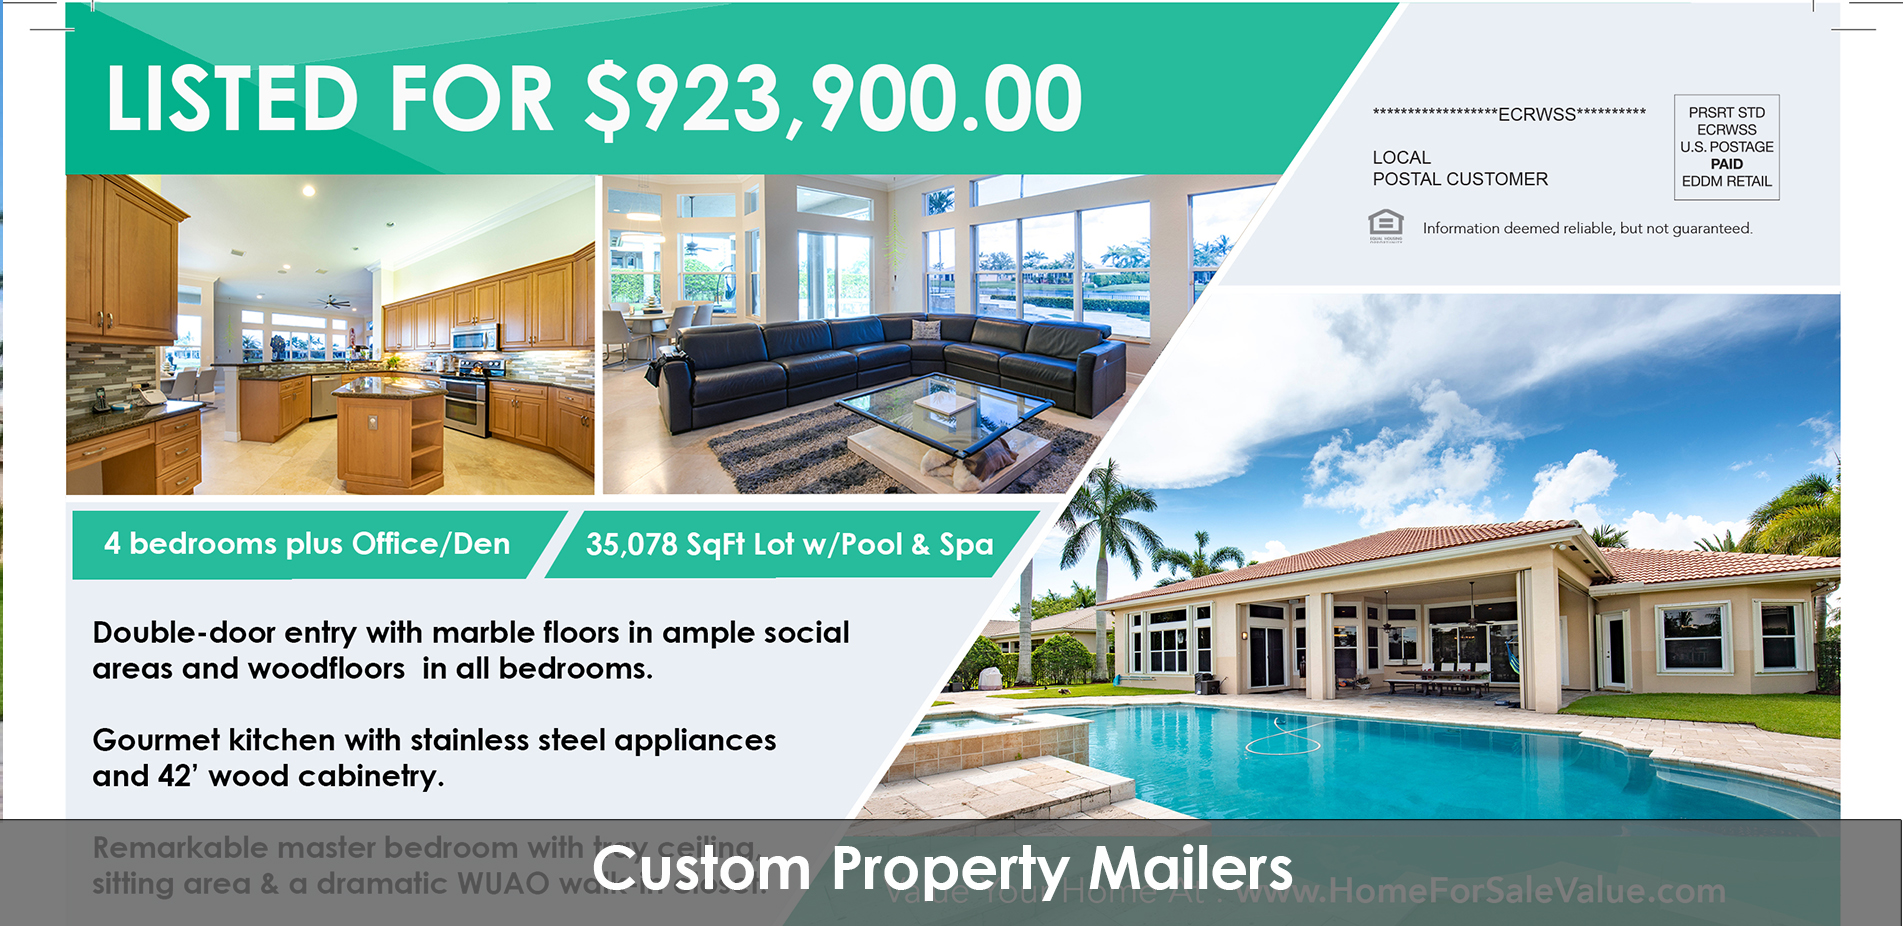 Custom Property Mailers.jpg